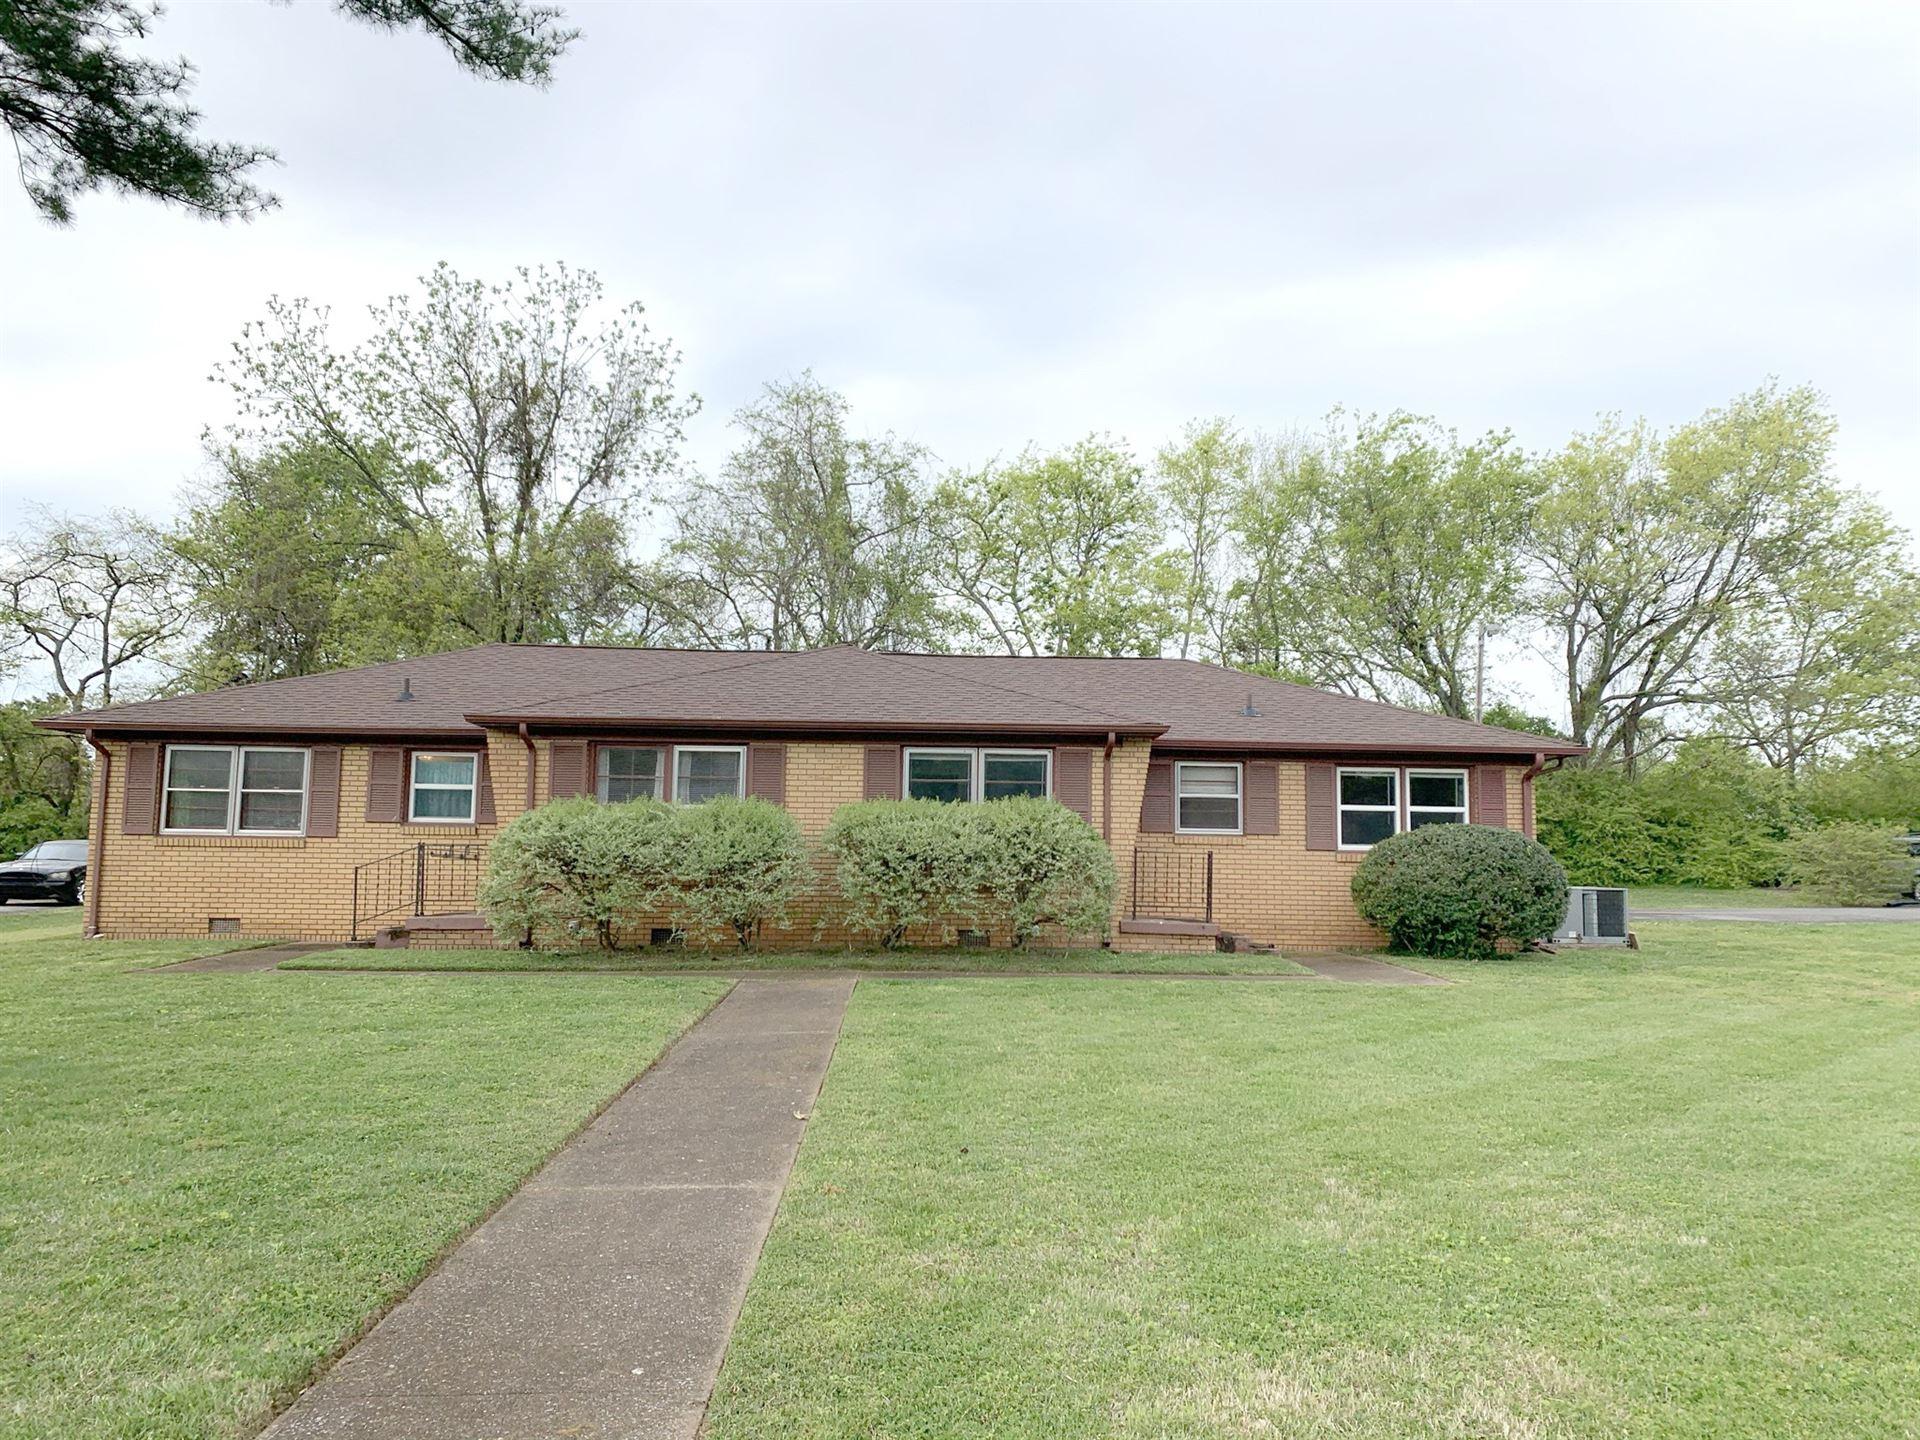 Photo of 1100 Kirkwood Ave, Murfreesboro, TN 37130 (MLS # 2247391)